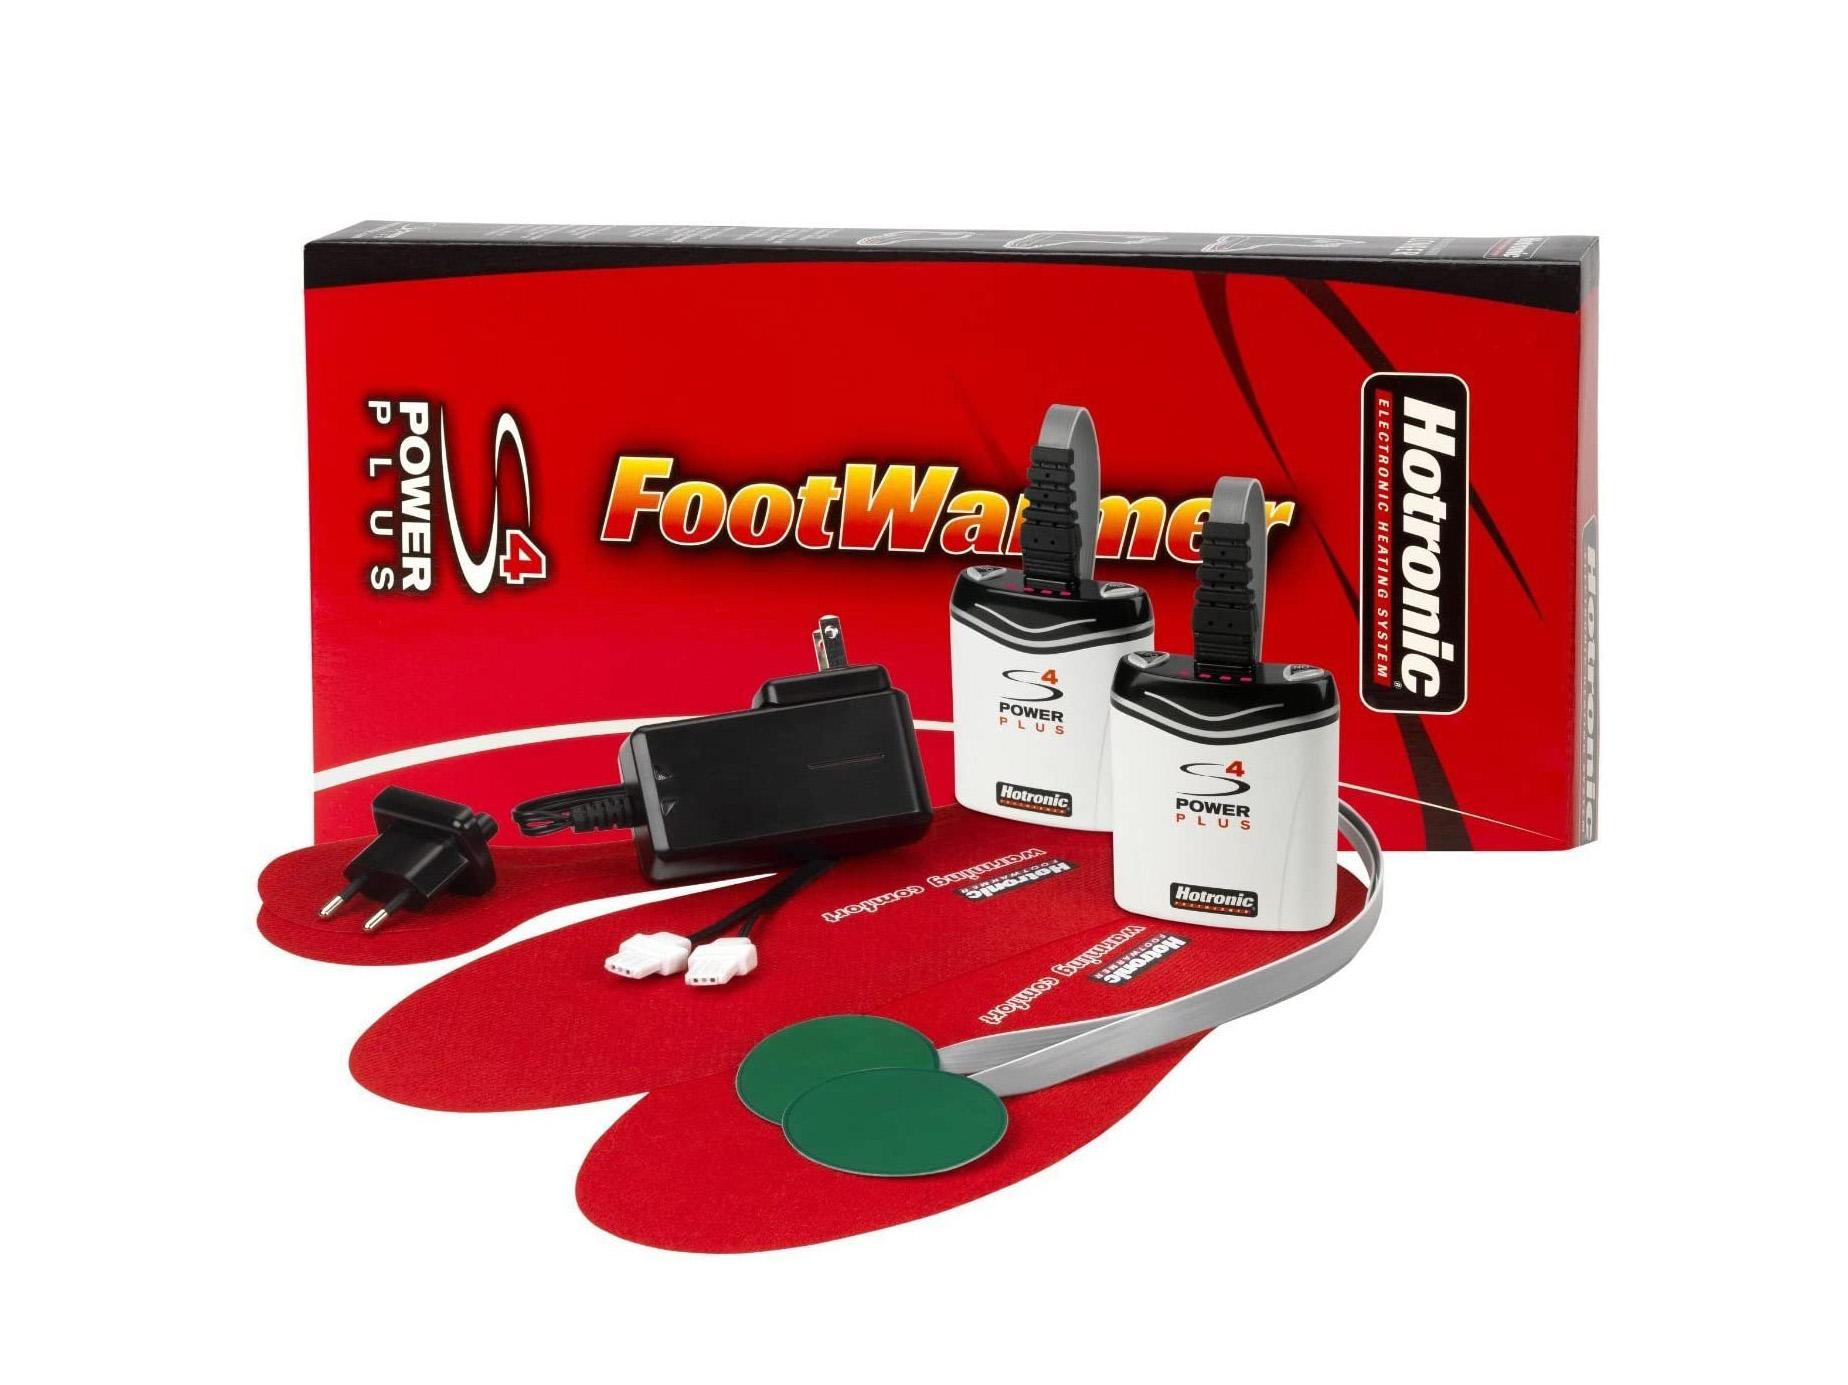 Best Winter Accessories - Hotronic Foot Warmer